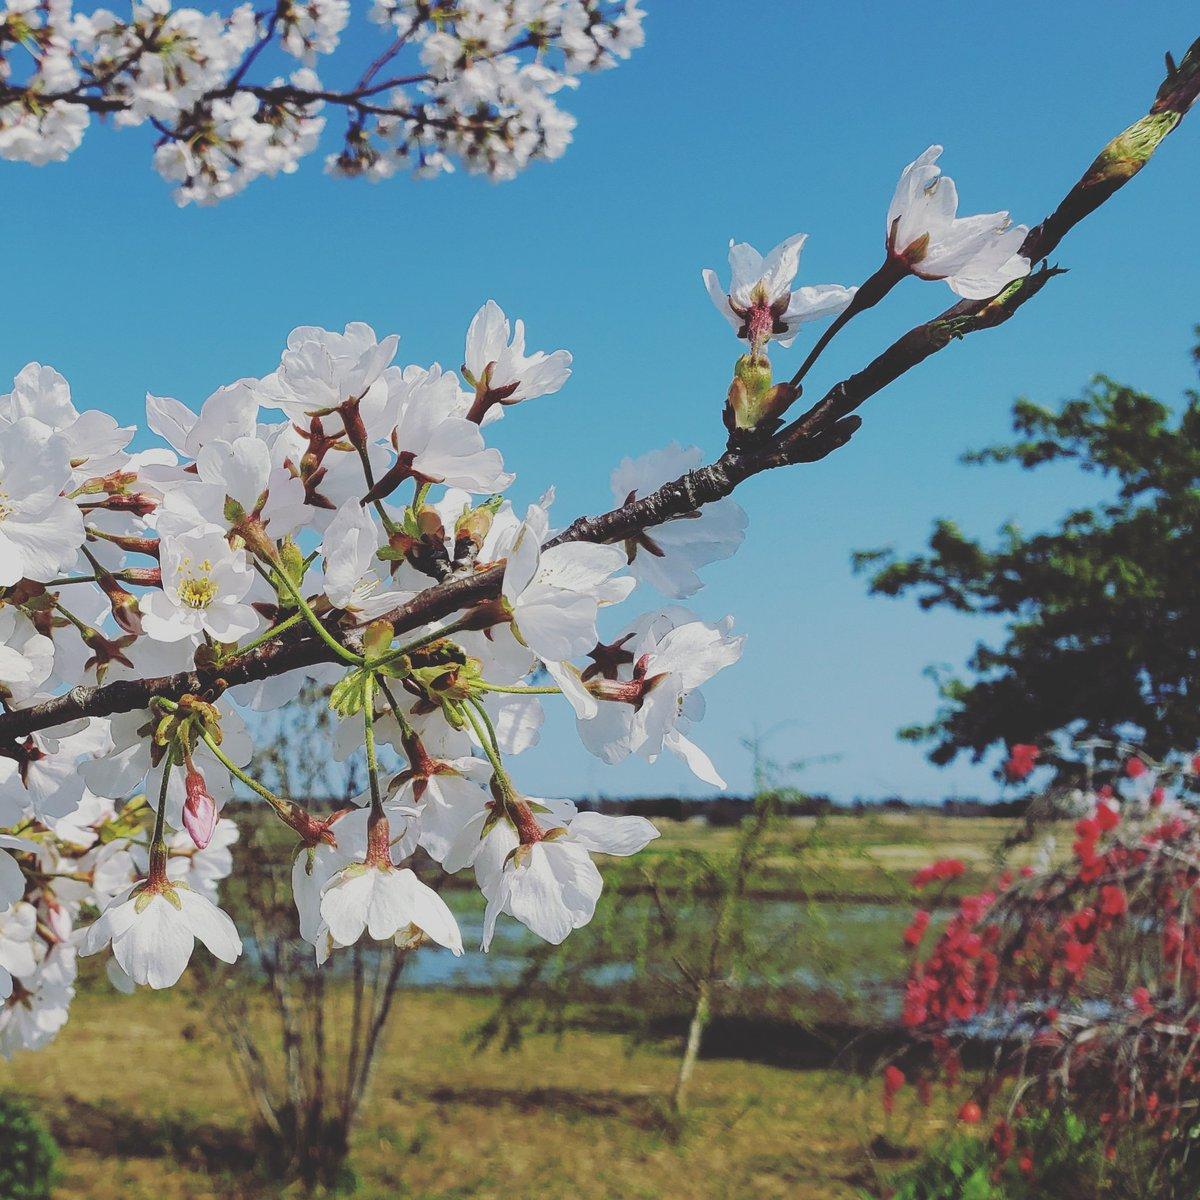 Sakura #japan #travel #love #beautiful #Likeforlike #followme #picoftheday #follow #SAKURA #CHERRYBLOSSOM